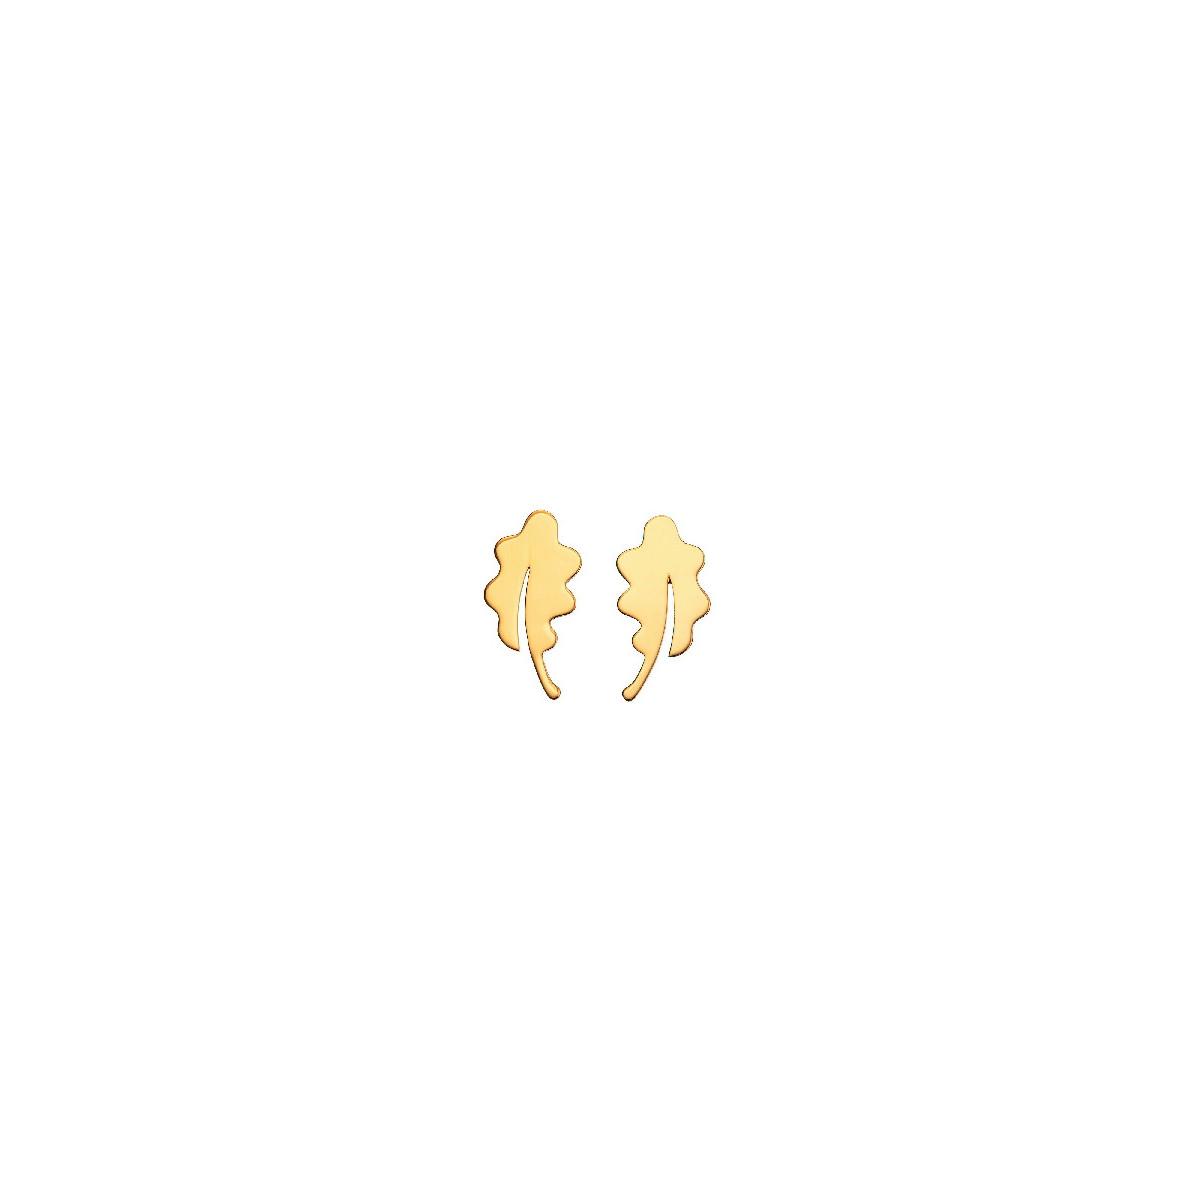 PENDIENTES PLATA - T0411263